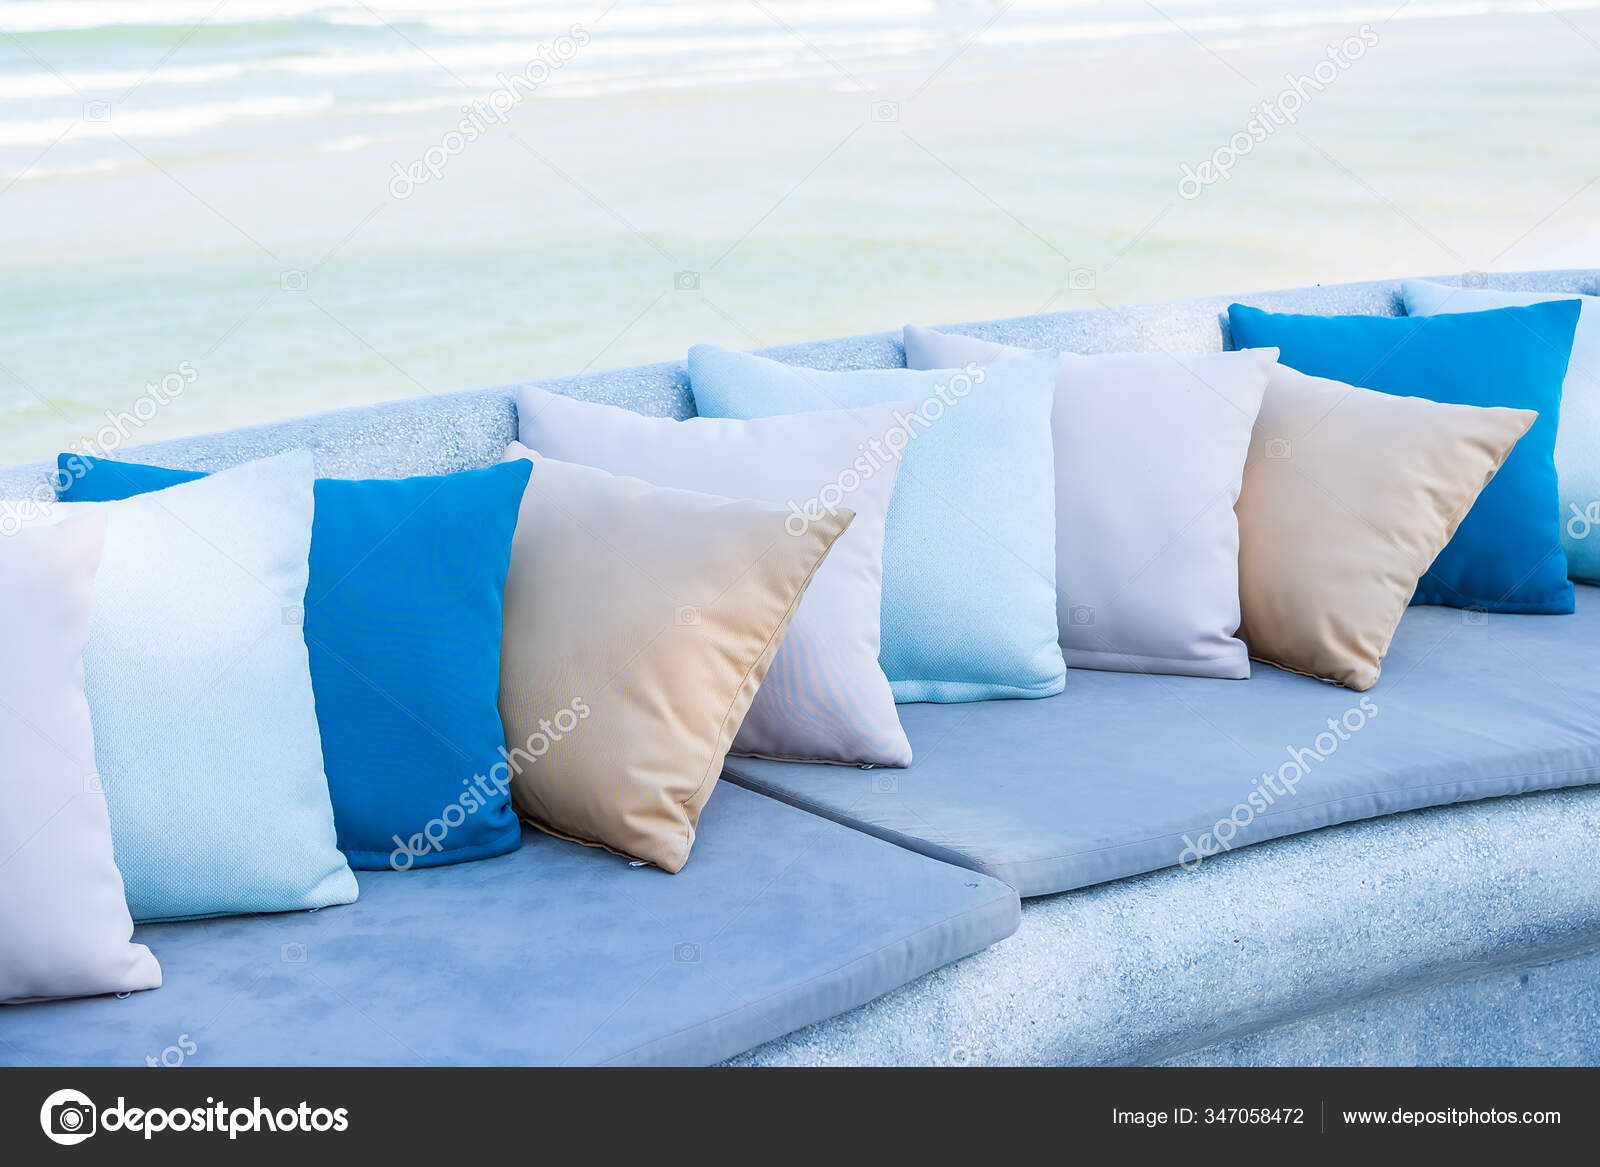 https depositphotos com 347058472 stock photo pillow chair sofa lounge outdoor html